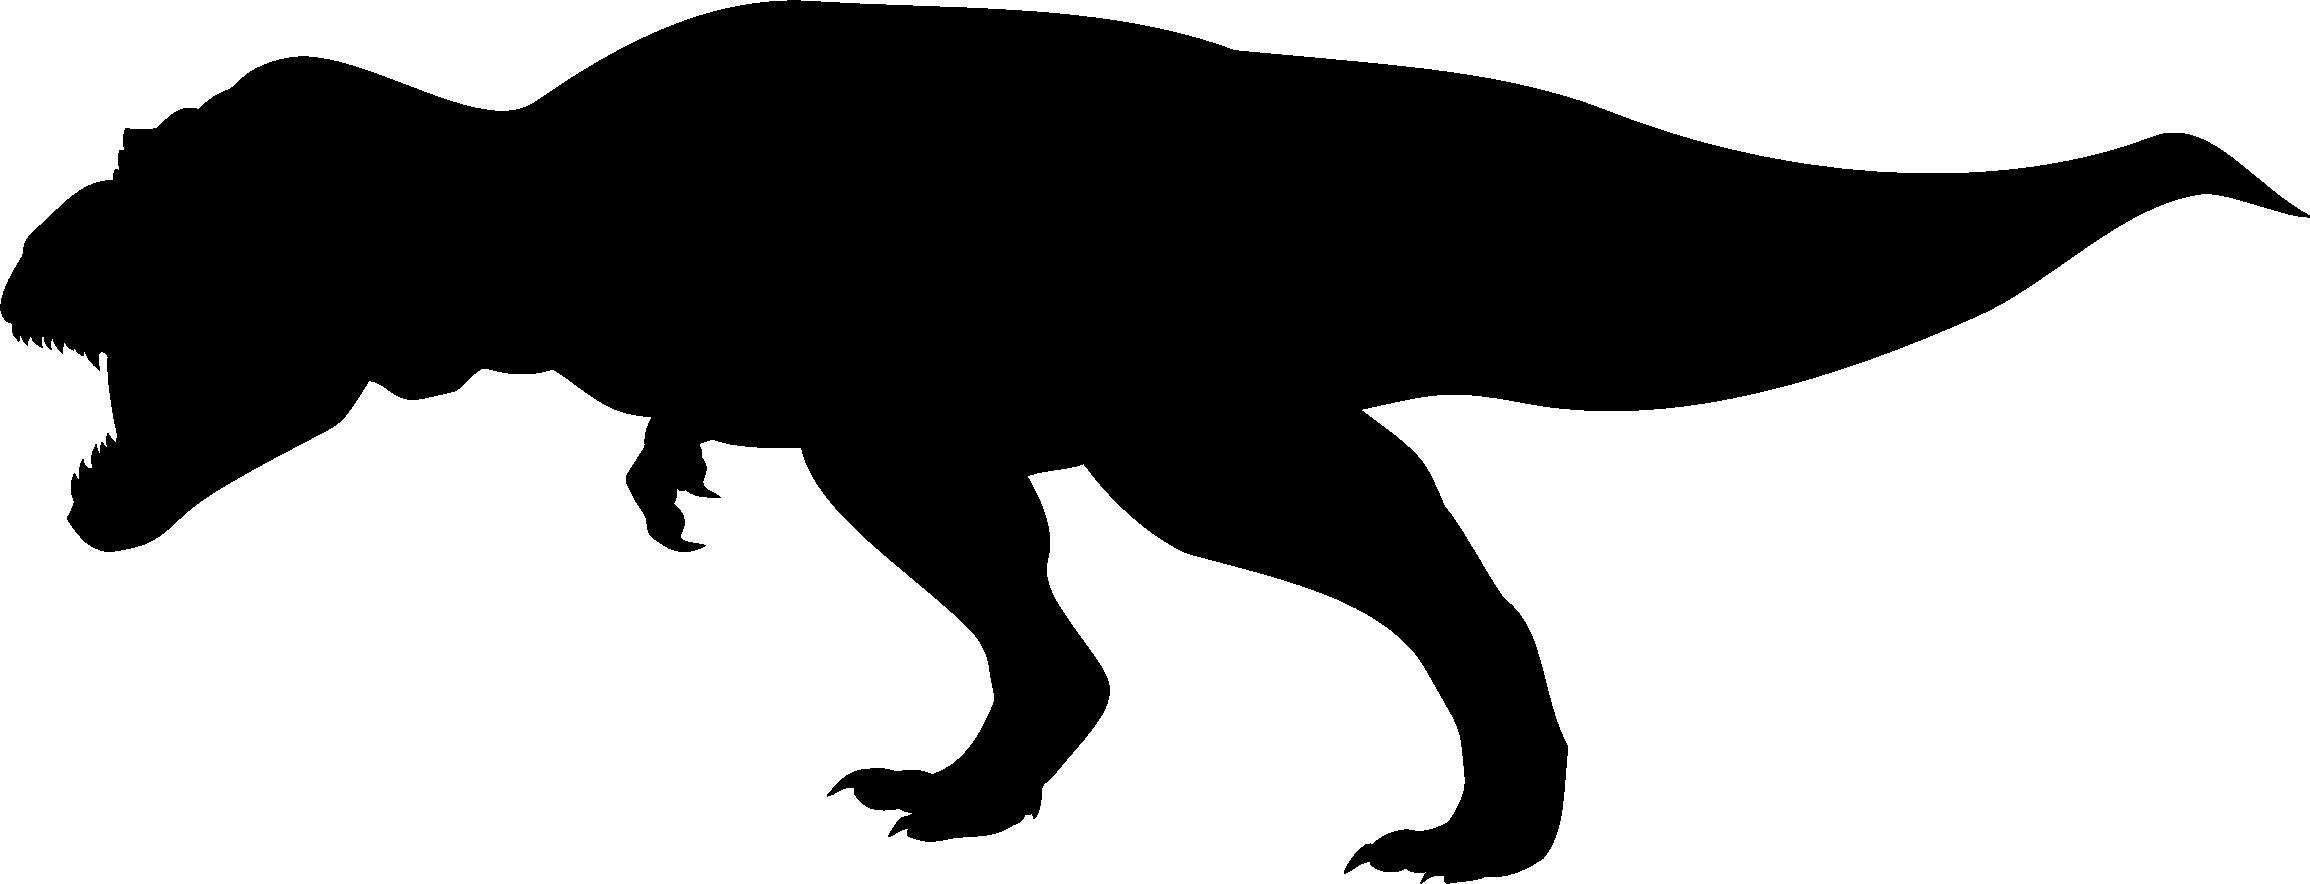 2310x884 Dinosaur Silhouette Clipart 53 Simple T Rex Robertjhastings Net